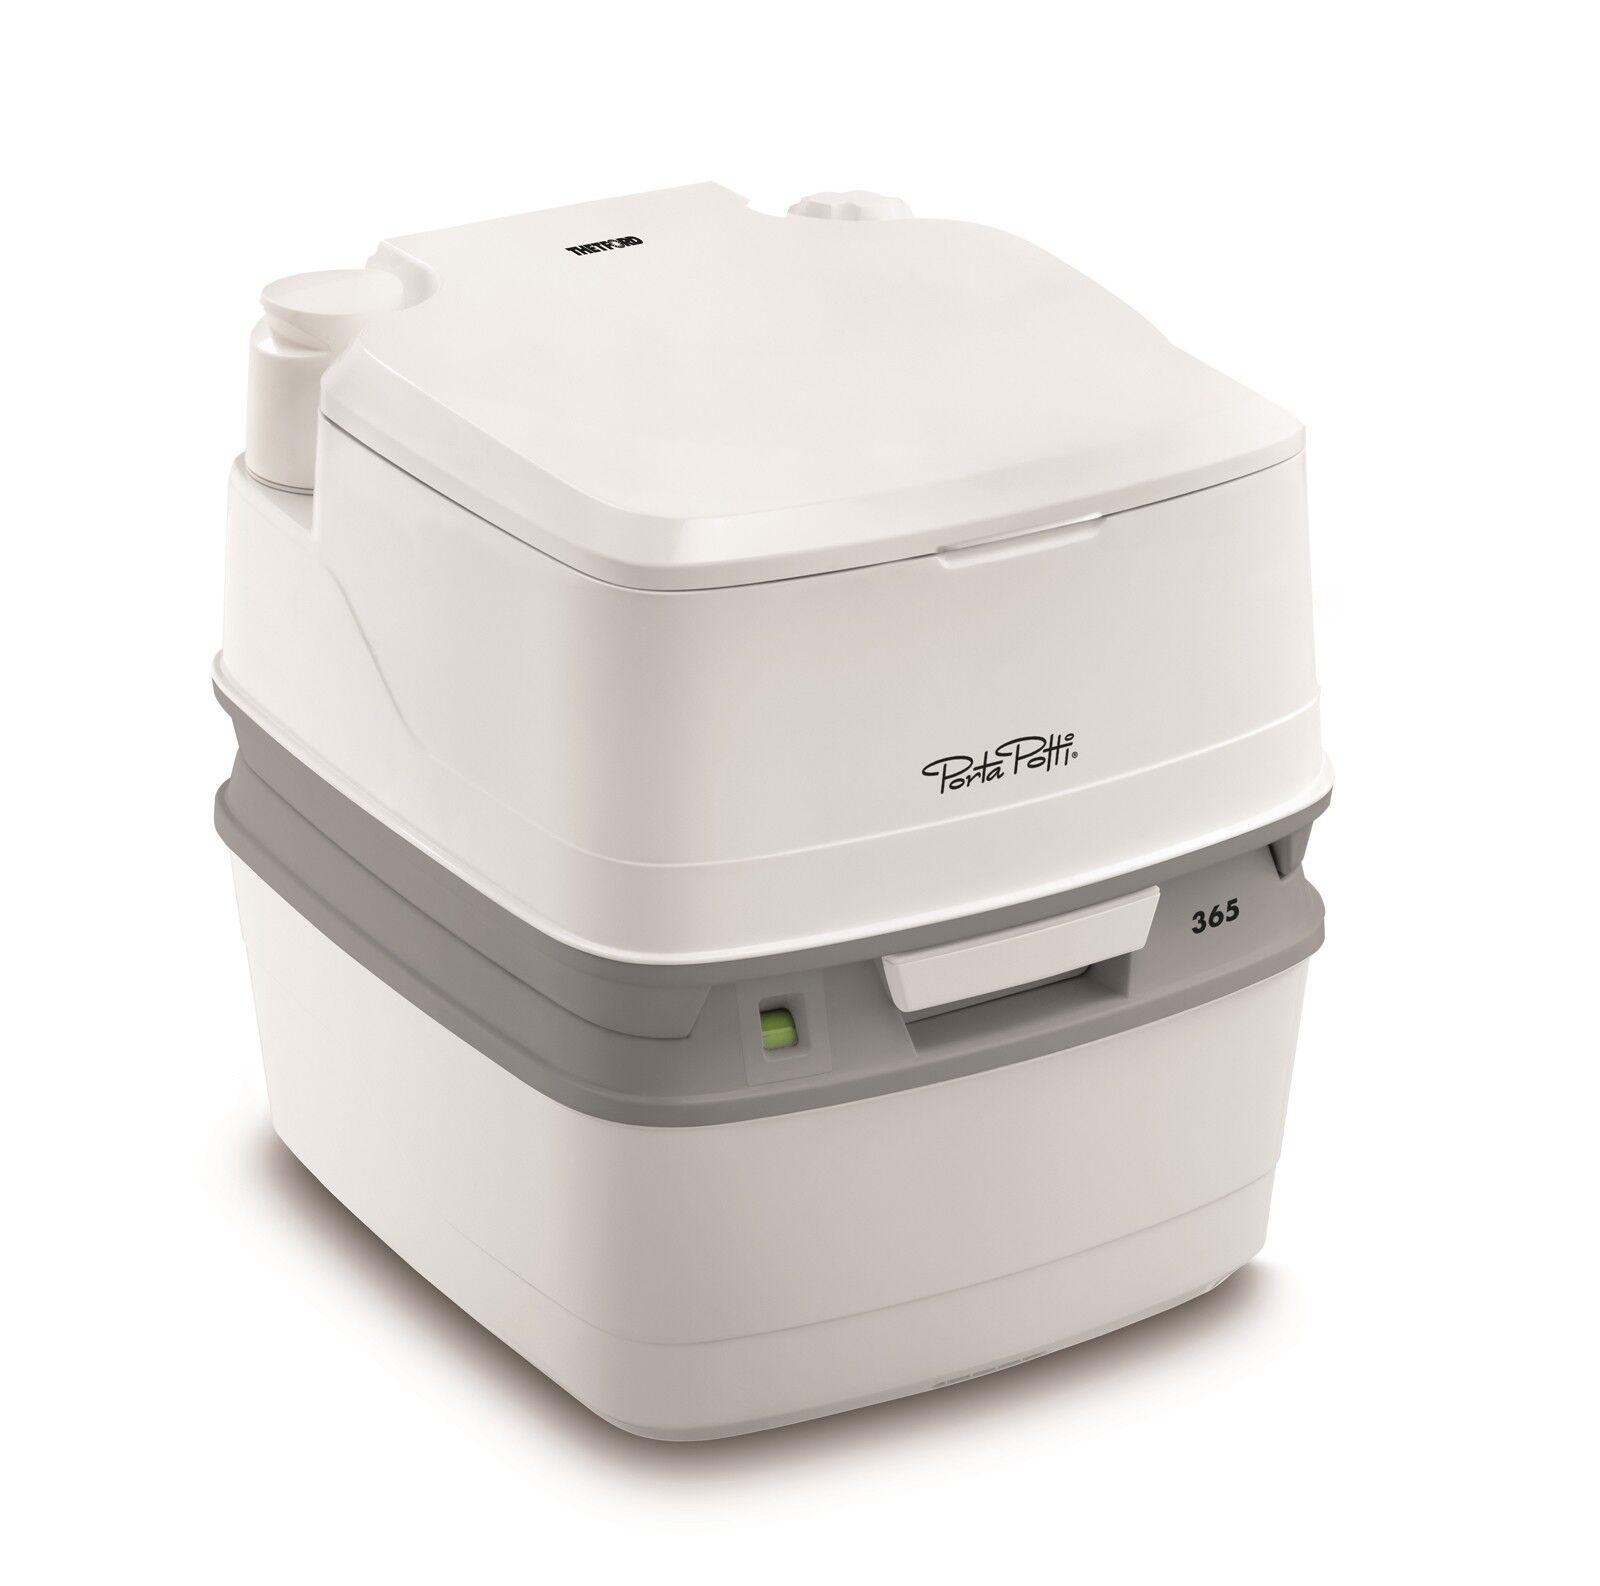 Thetford Porta Potti 365 Qube White Toilet Wc Camping Chemical Mobile